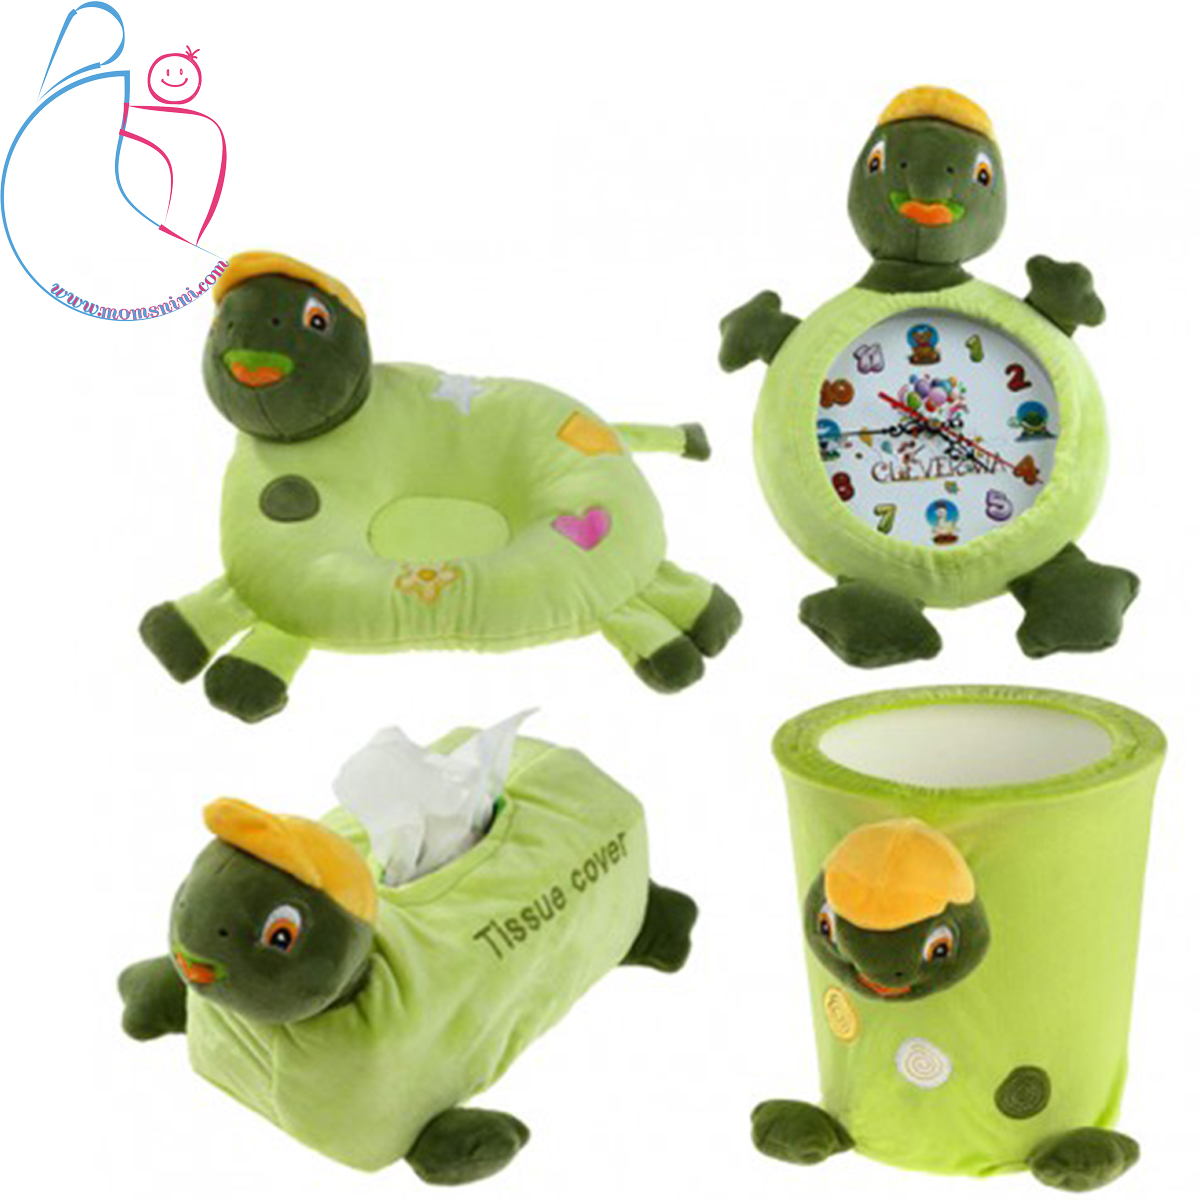 ست پولیشی ۴ تکه مدل  لاکپشت